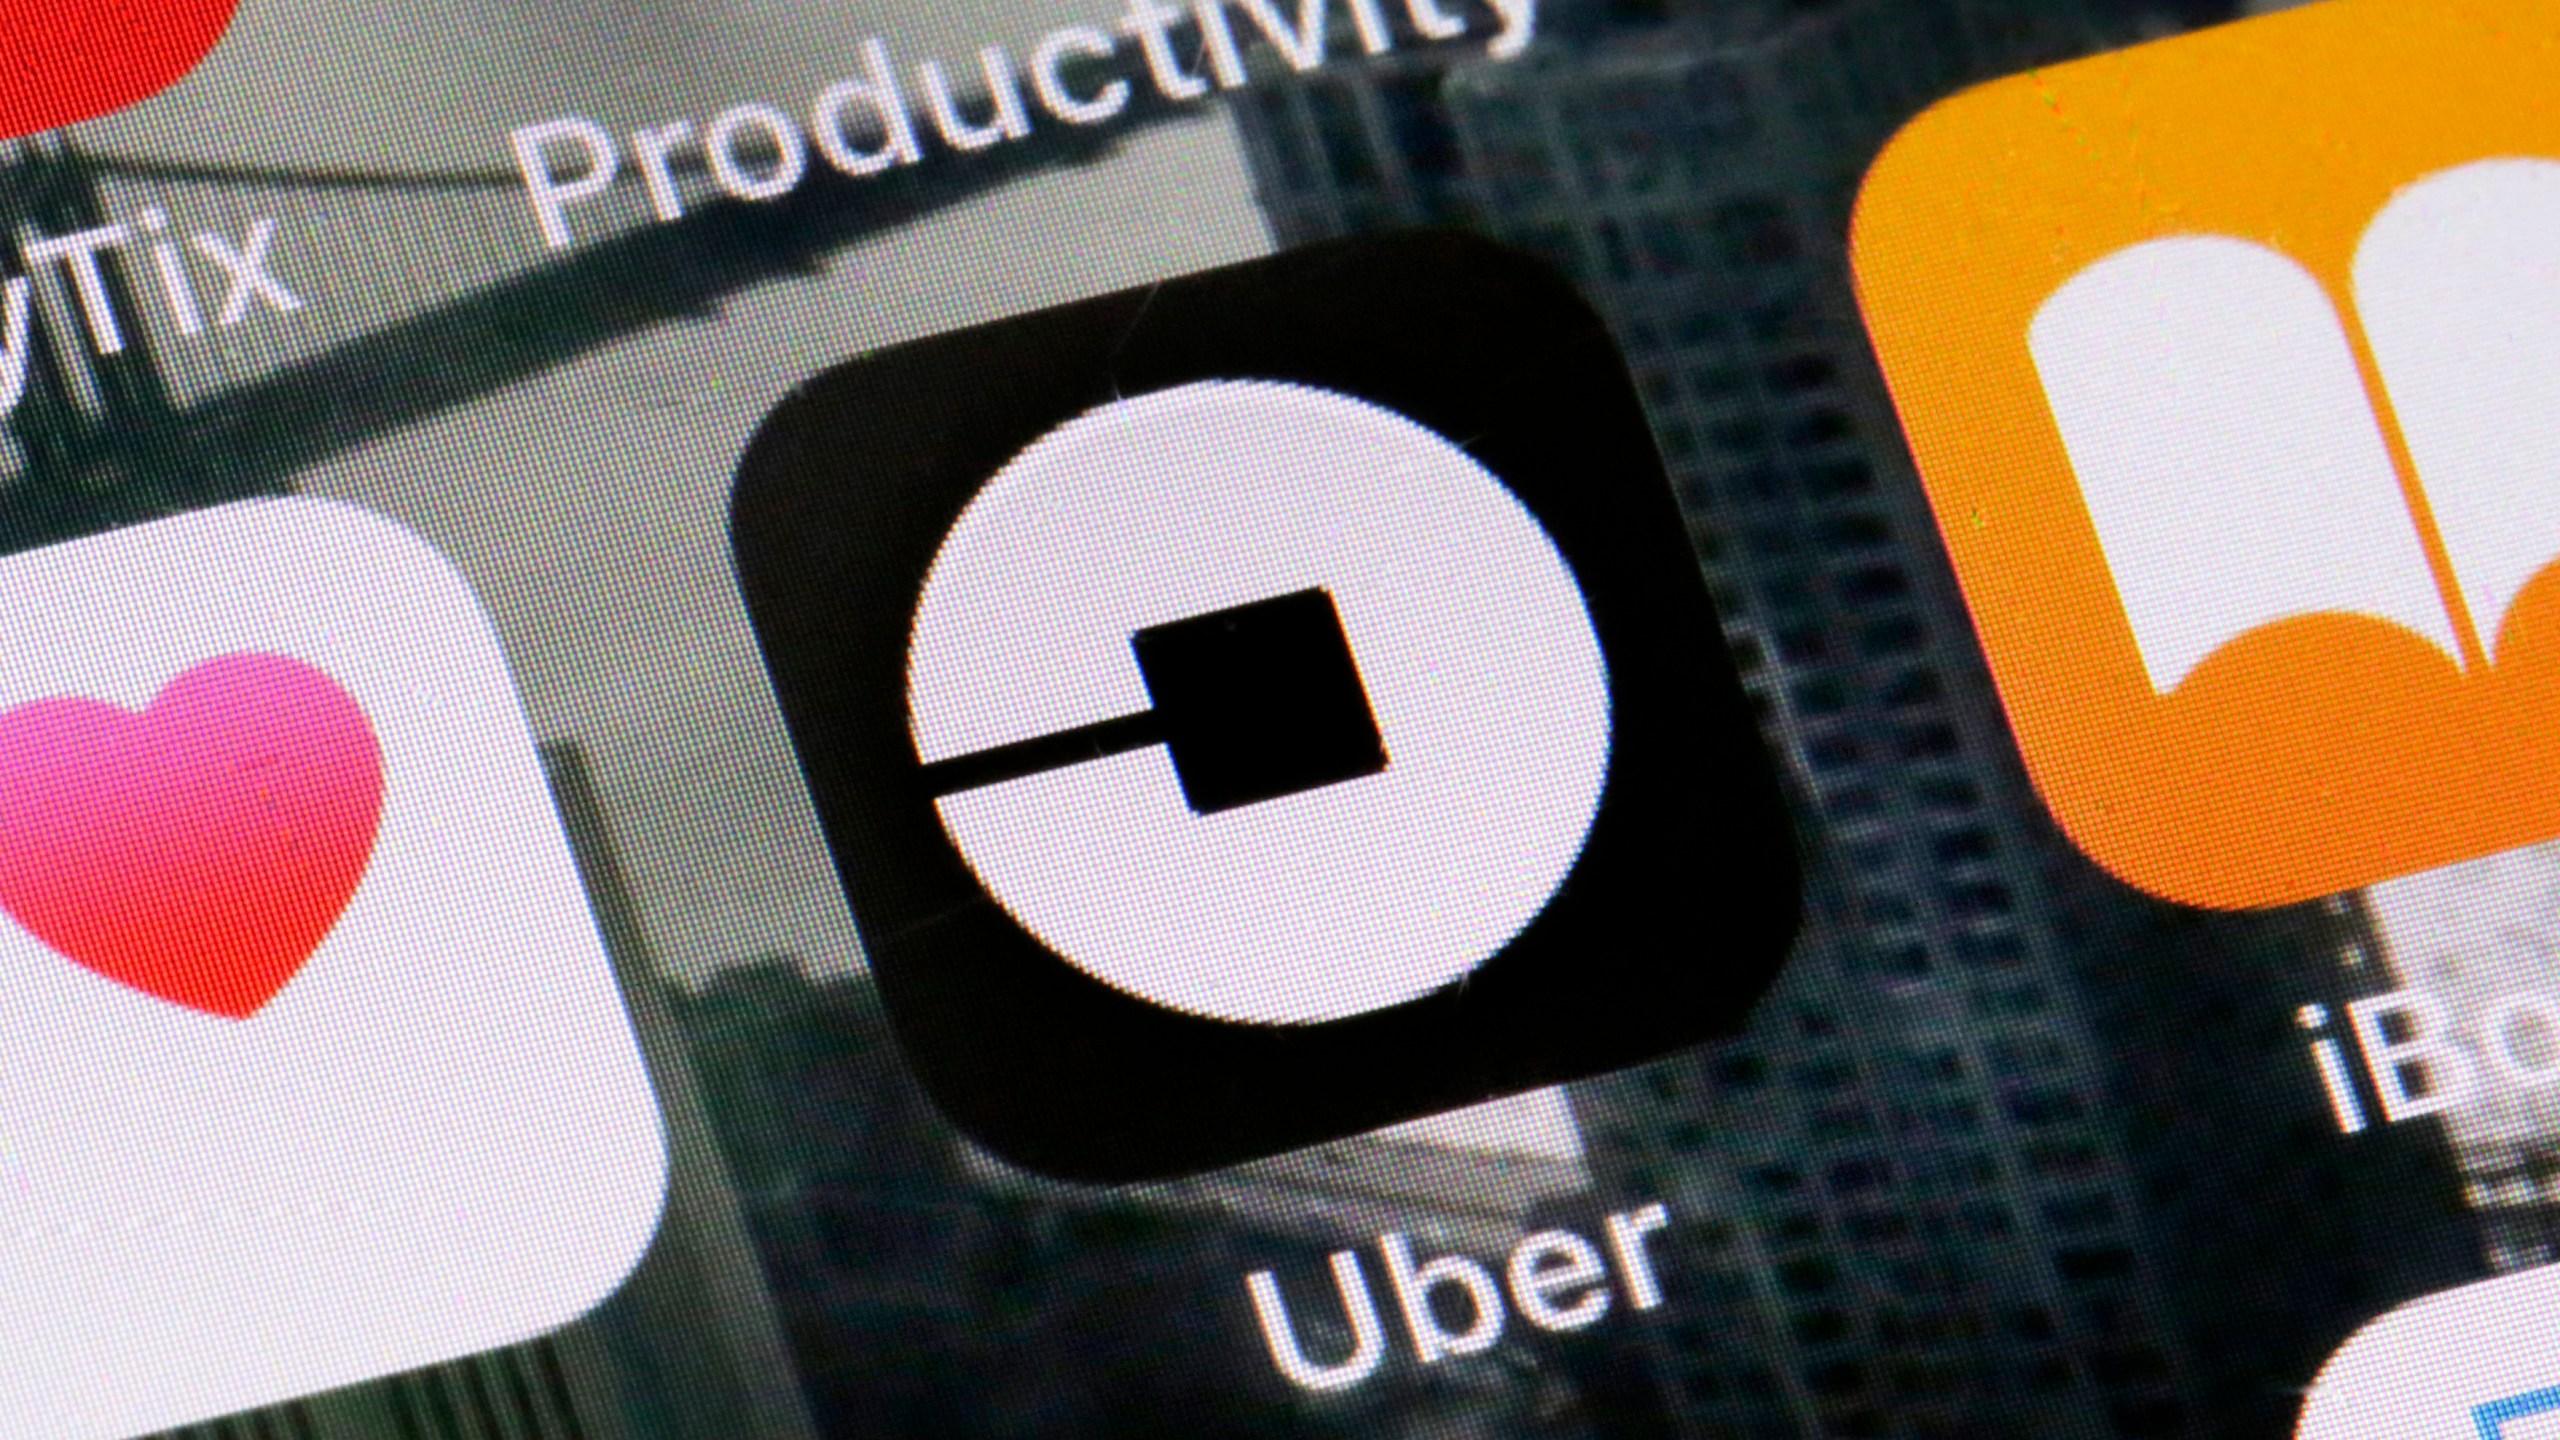 Uber_Safety_14629-159532.jpg05822541